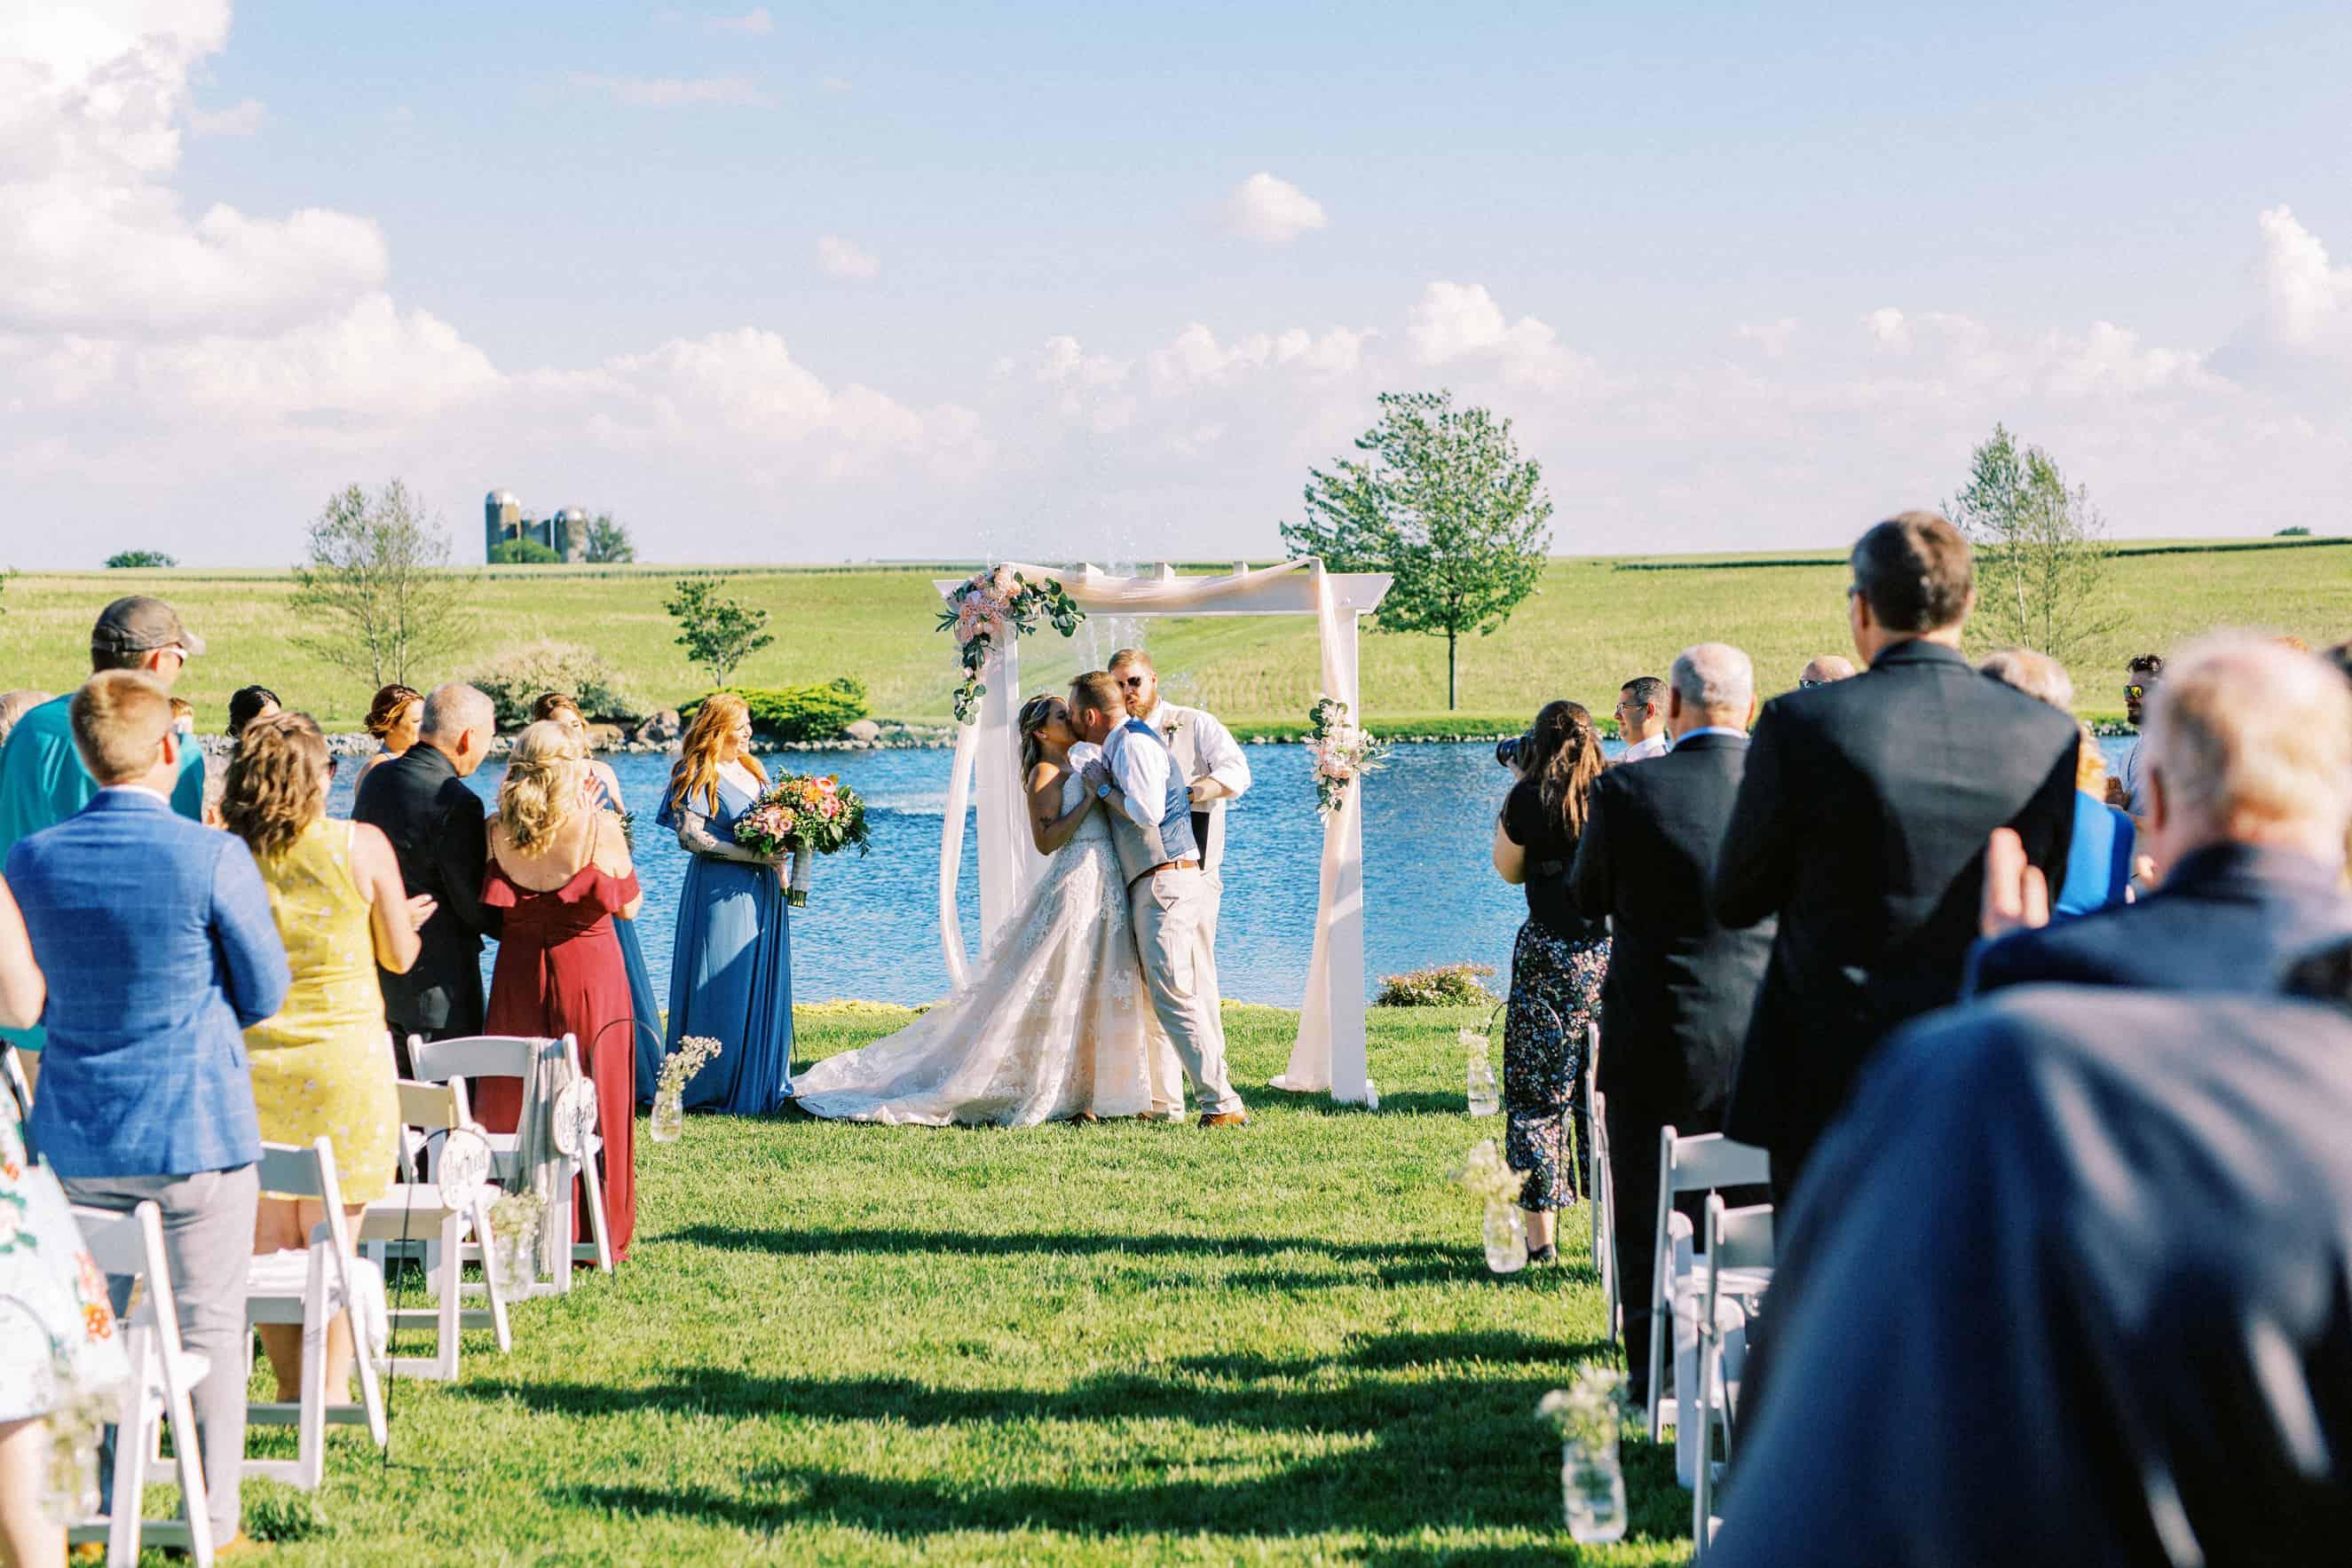 Outdoor wedding ceremonies Harvest View Barn at Hershey Farms